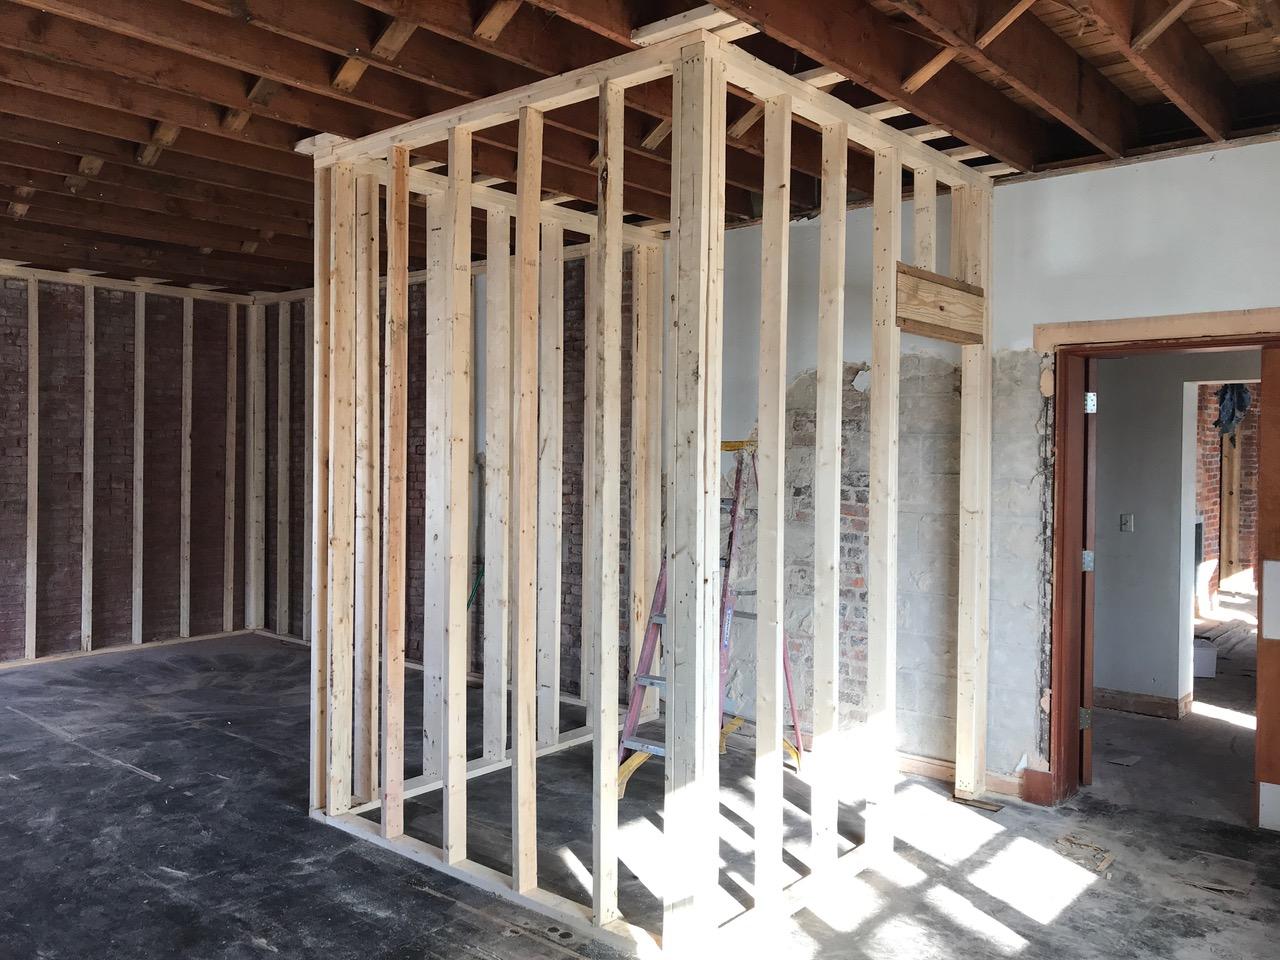 Post demolition, room definition takes shape